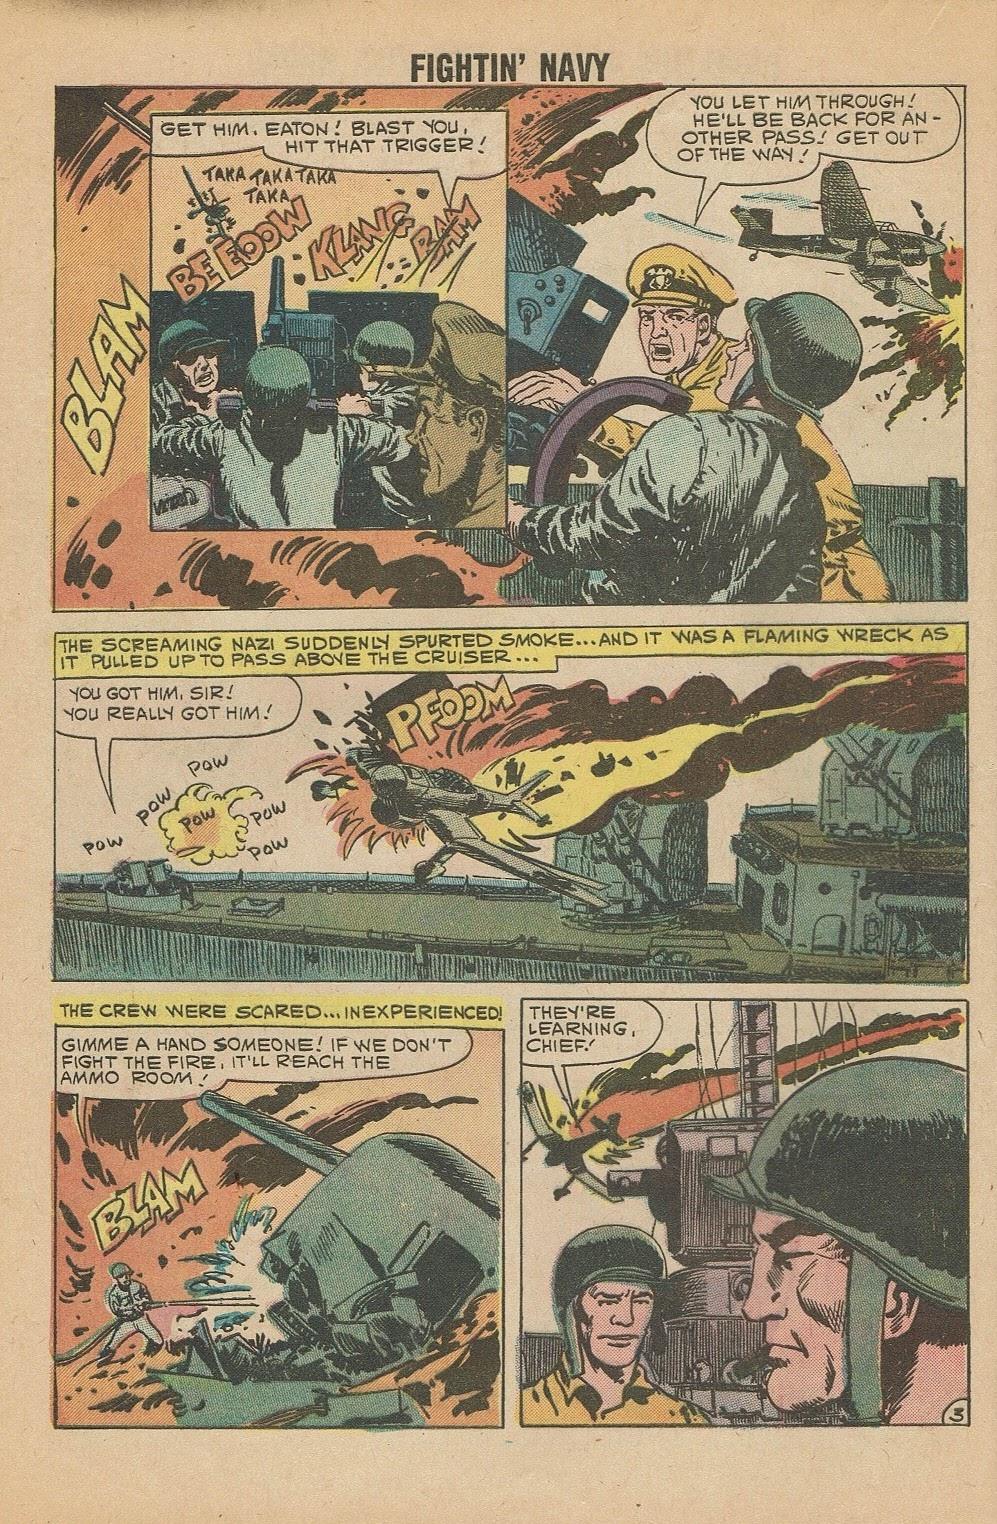 Read online Fightin' Navy comic -  Issue #95 - 28